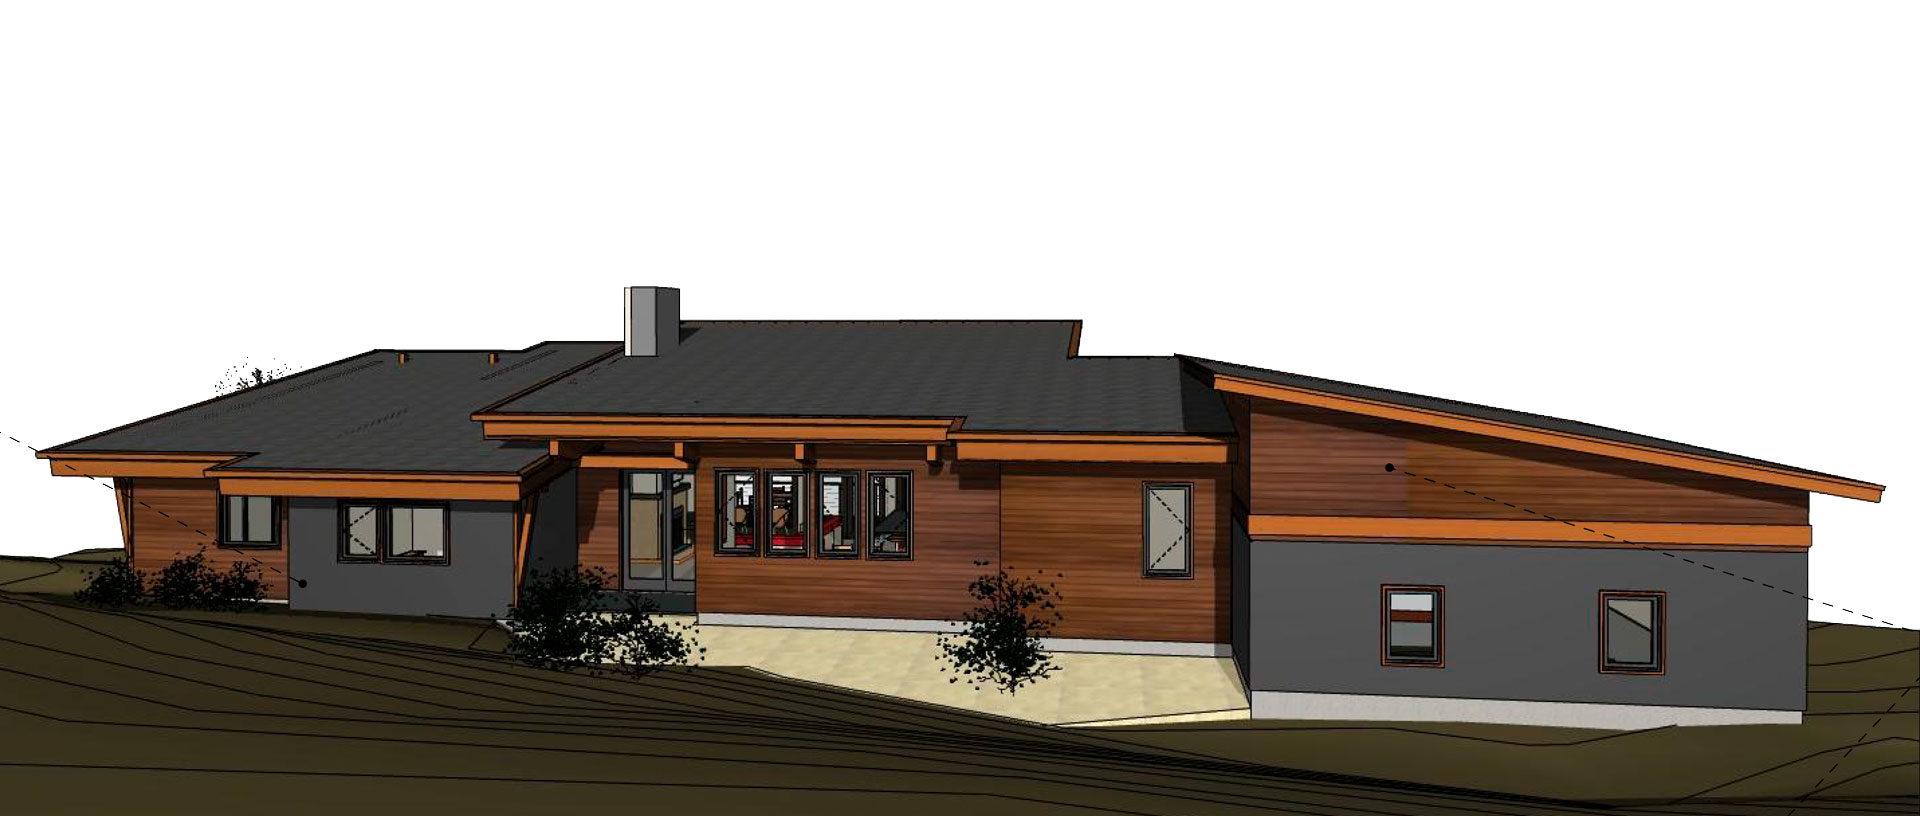 Aspen ridge mccall cabin mccall design planning for Aspen ridge